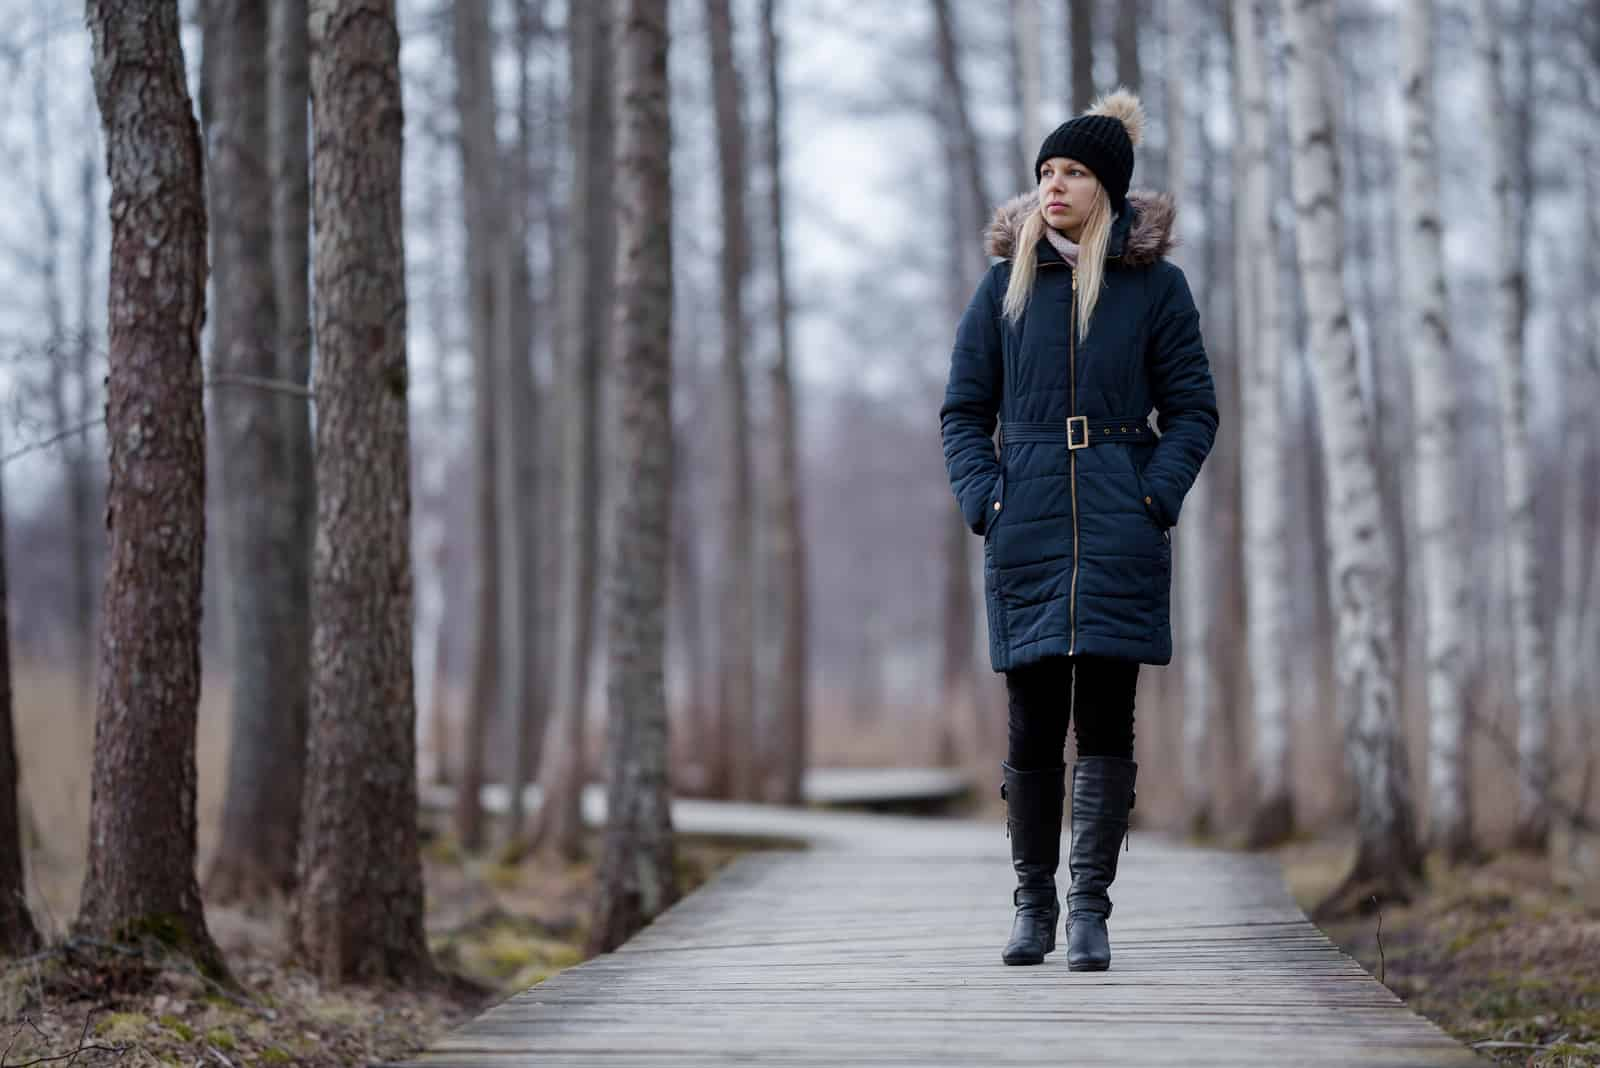 Frau in dunkler warmer Kleidung geht langsam